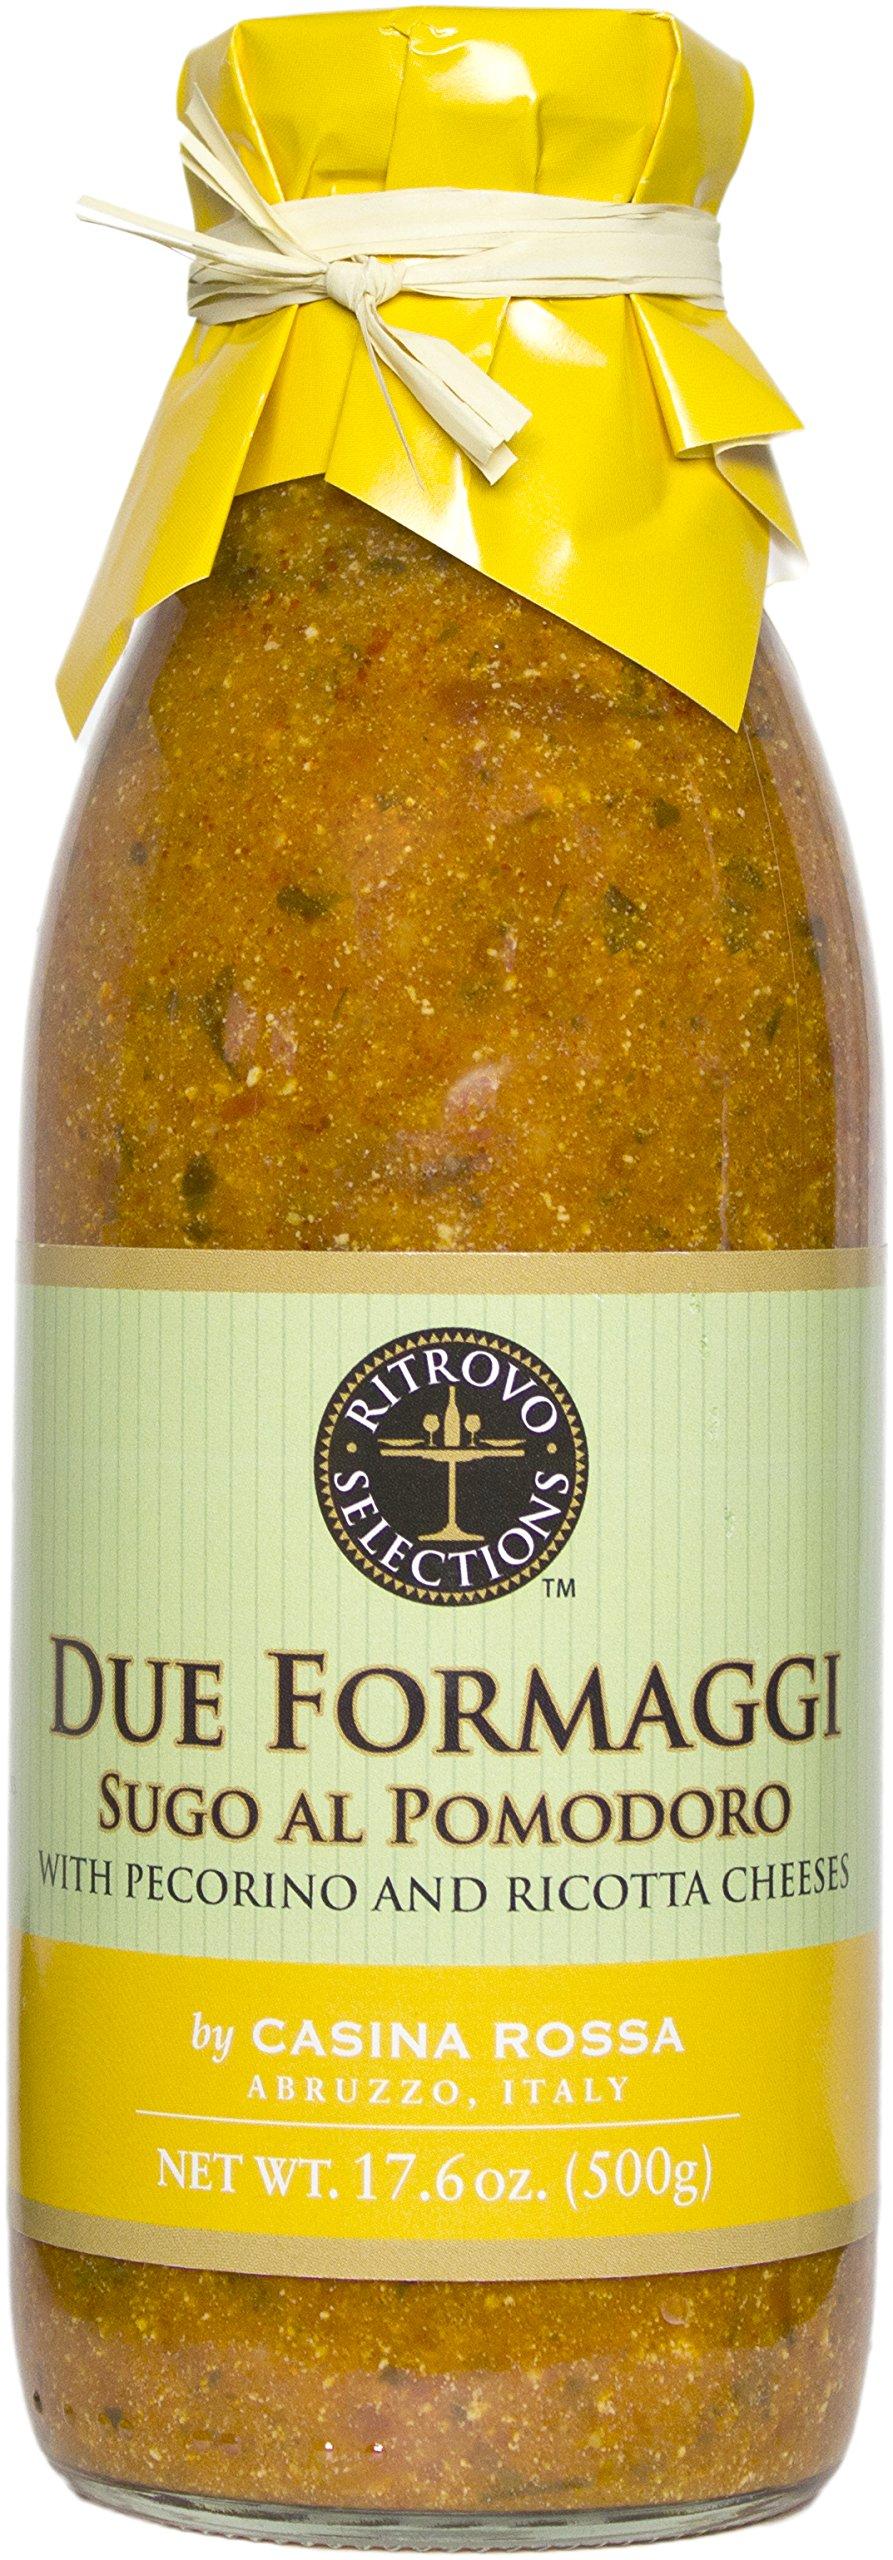 Casina Rossa Due Formaggi Pasta Sauce with Pecorino and Ricotta, 17.6 oz